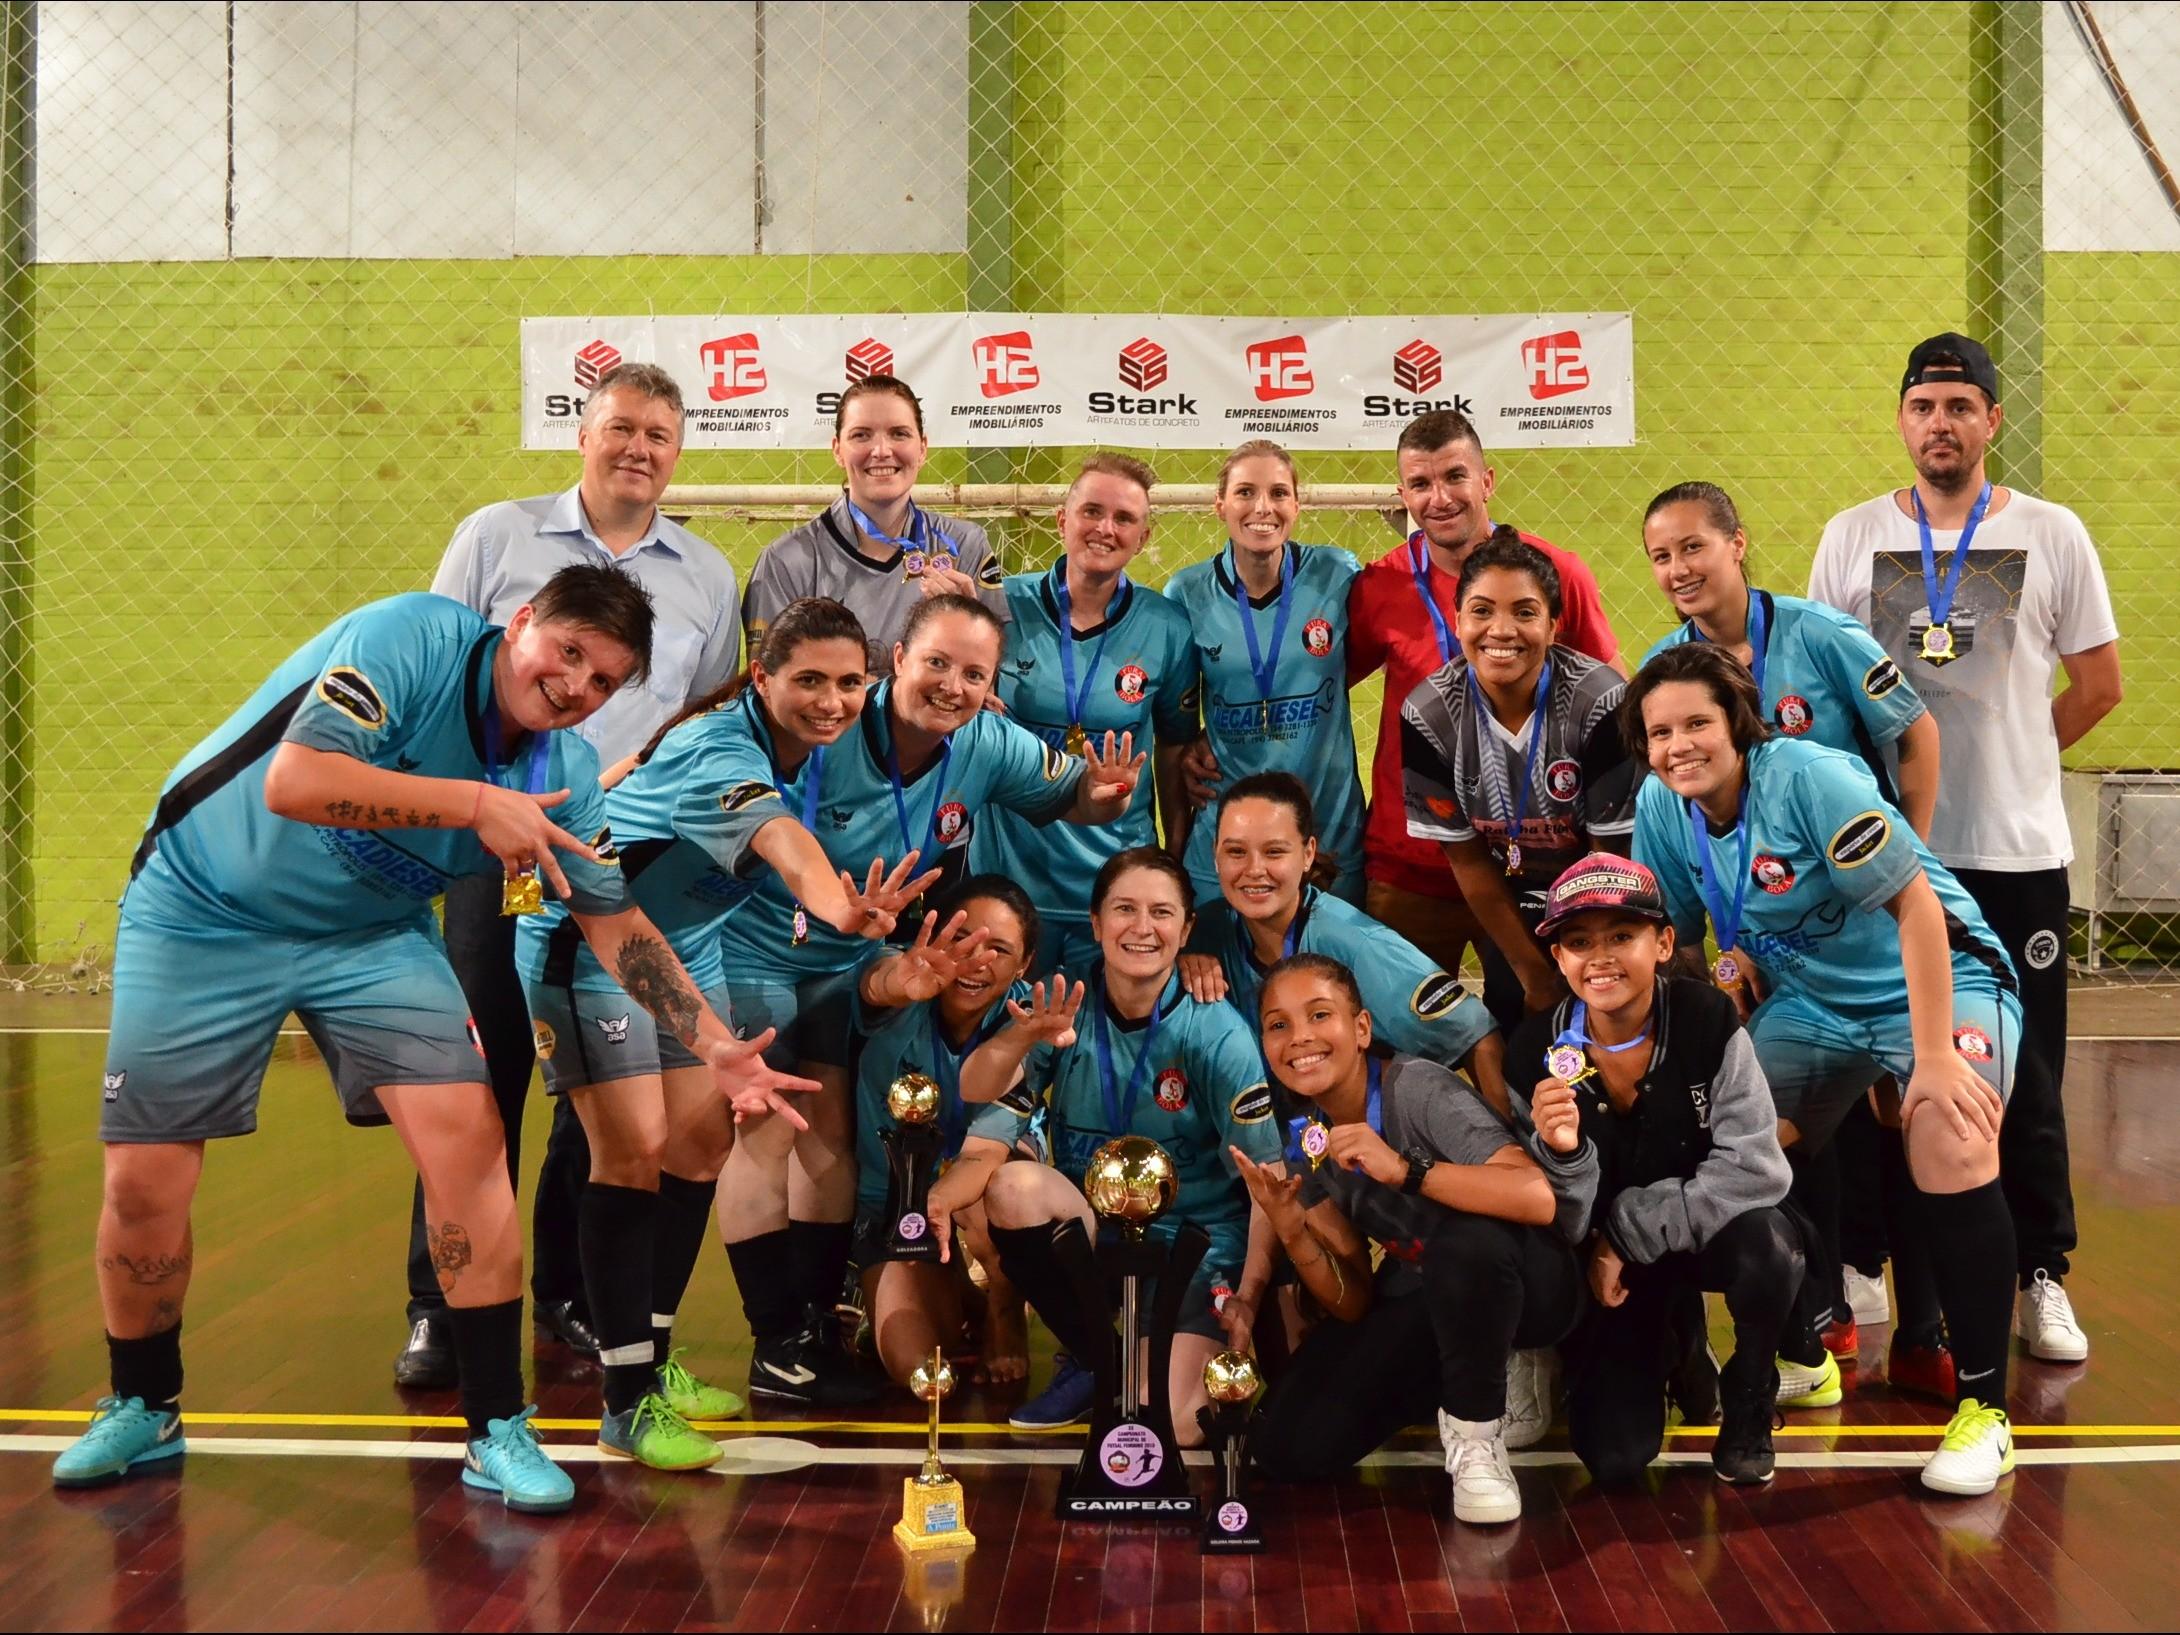 Foto de capa da notícia: Fura Bola conquista título do Campeonato de Futsal Feminino 2018